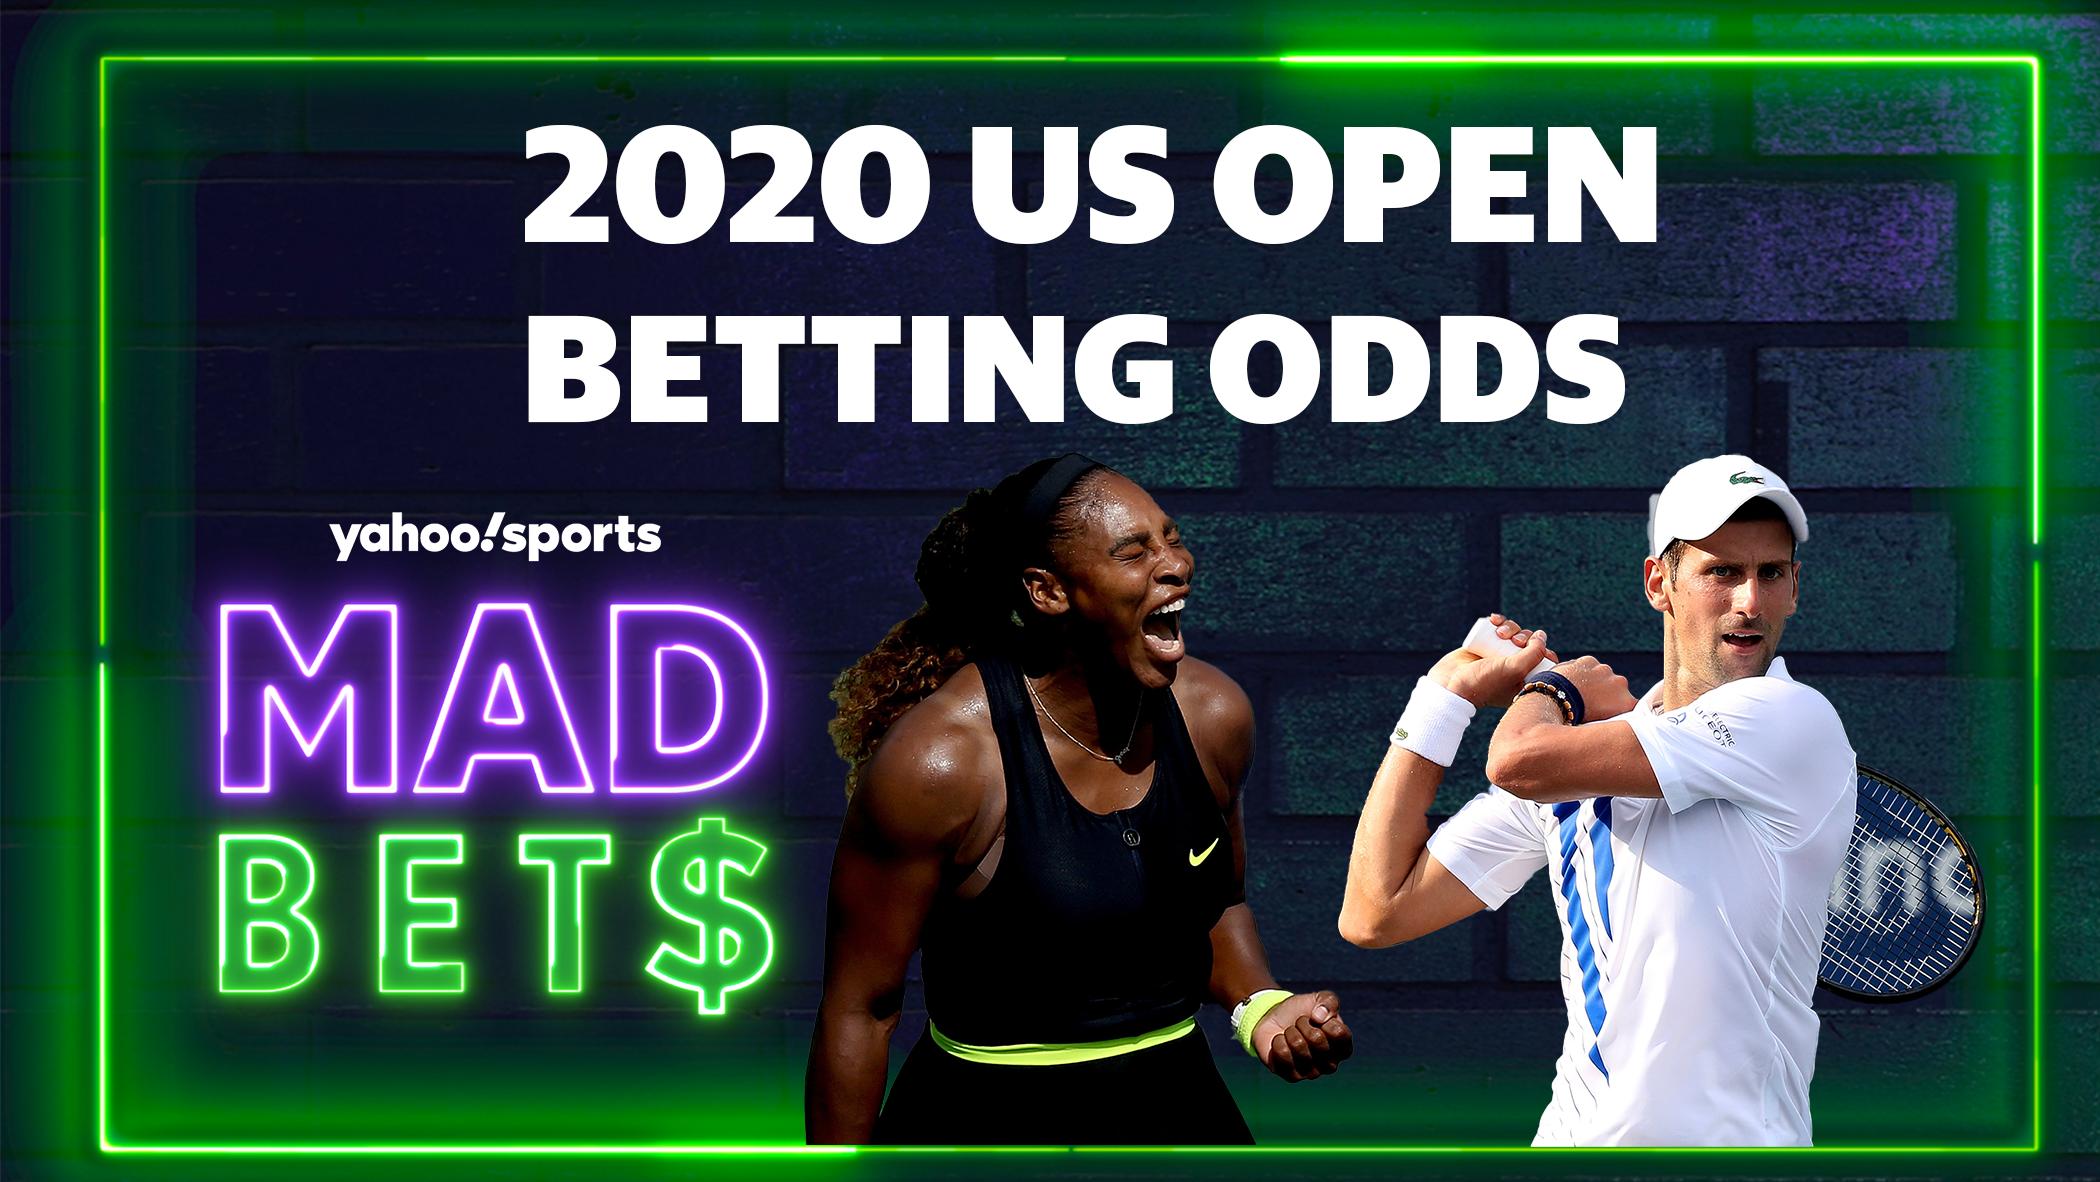 Betting open sports betting best odds